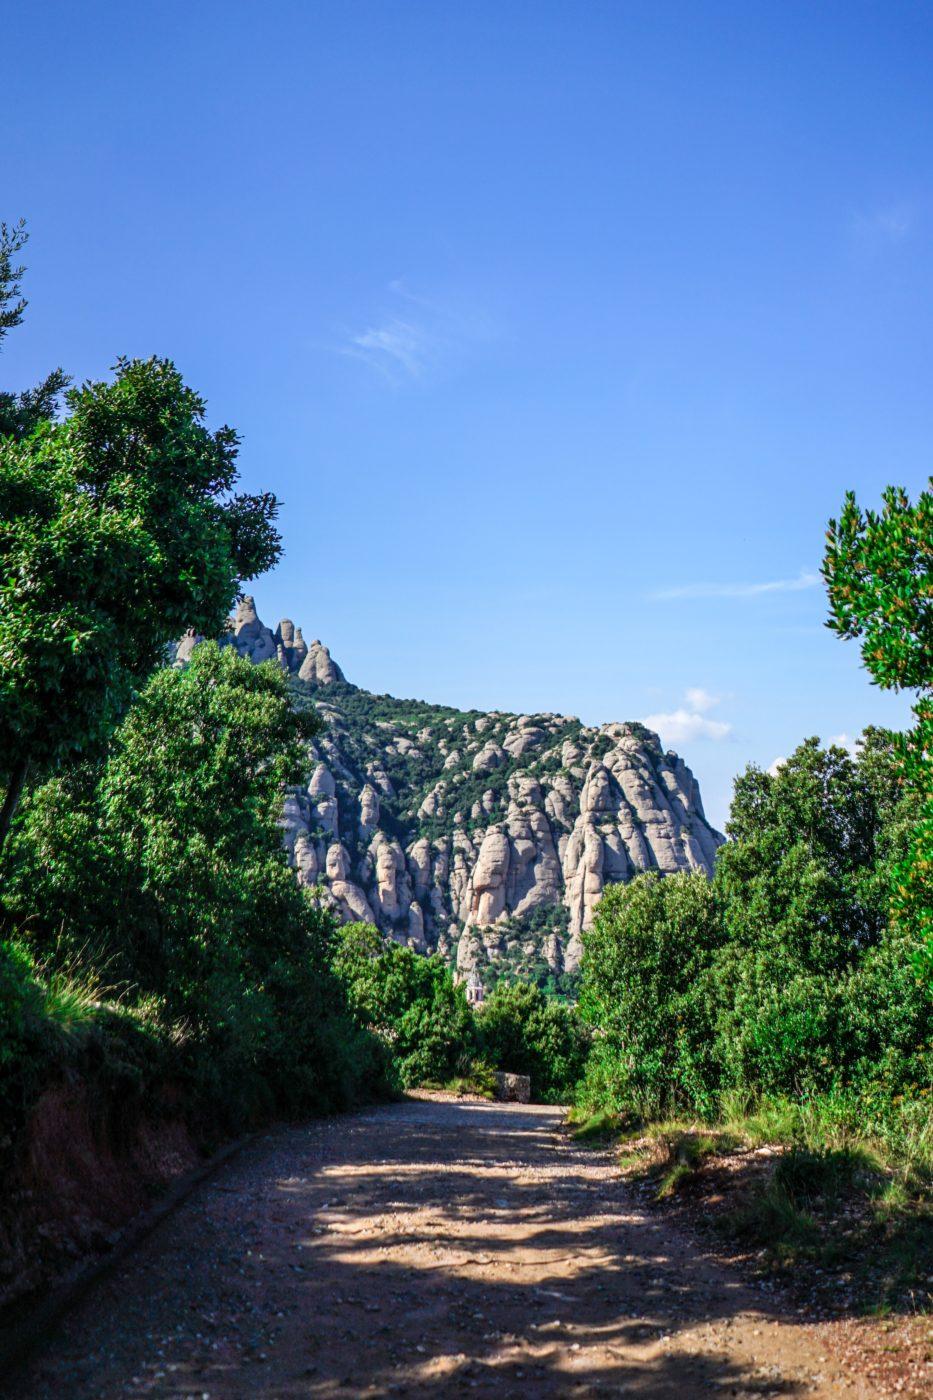 montaña de montserrat, montserrat mountain